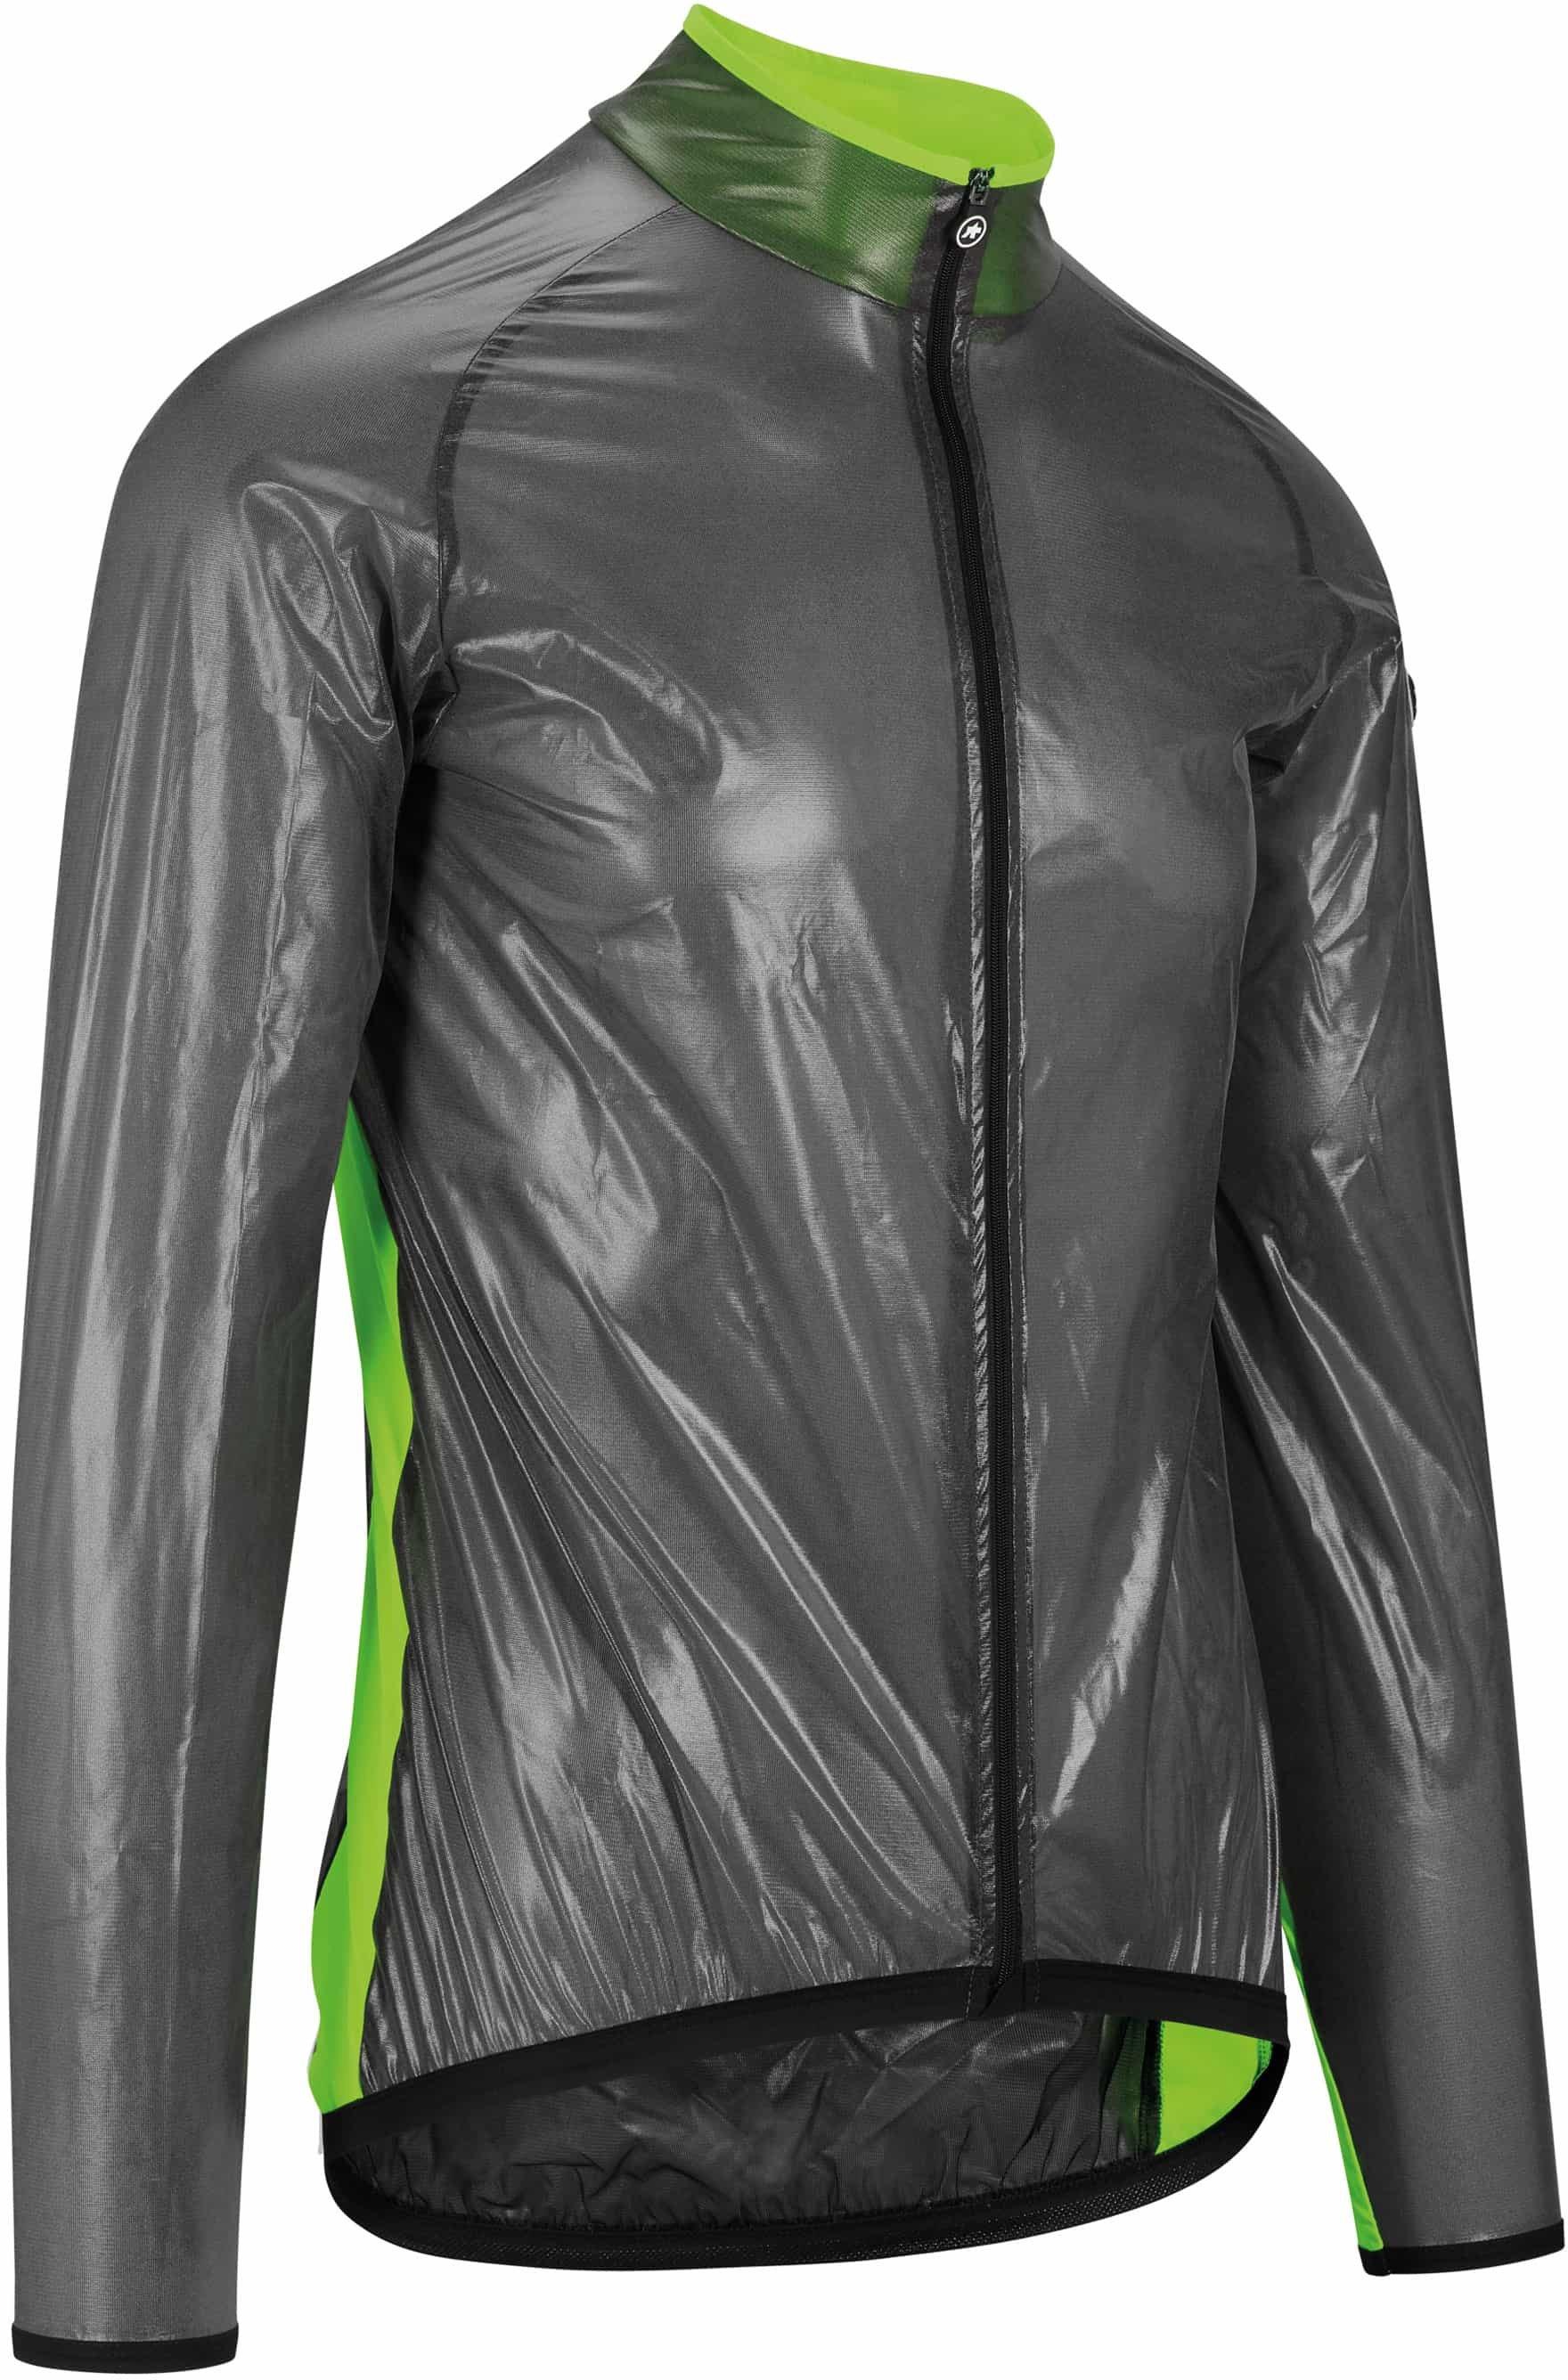 Assos MILLE GT Clima Jacket - Sort/Grøn  »  Cloth Size: L (Large)